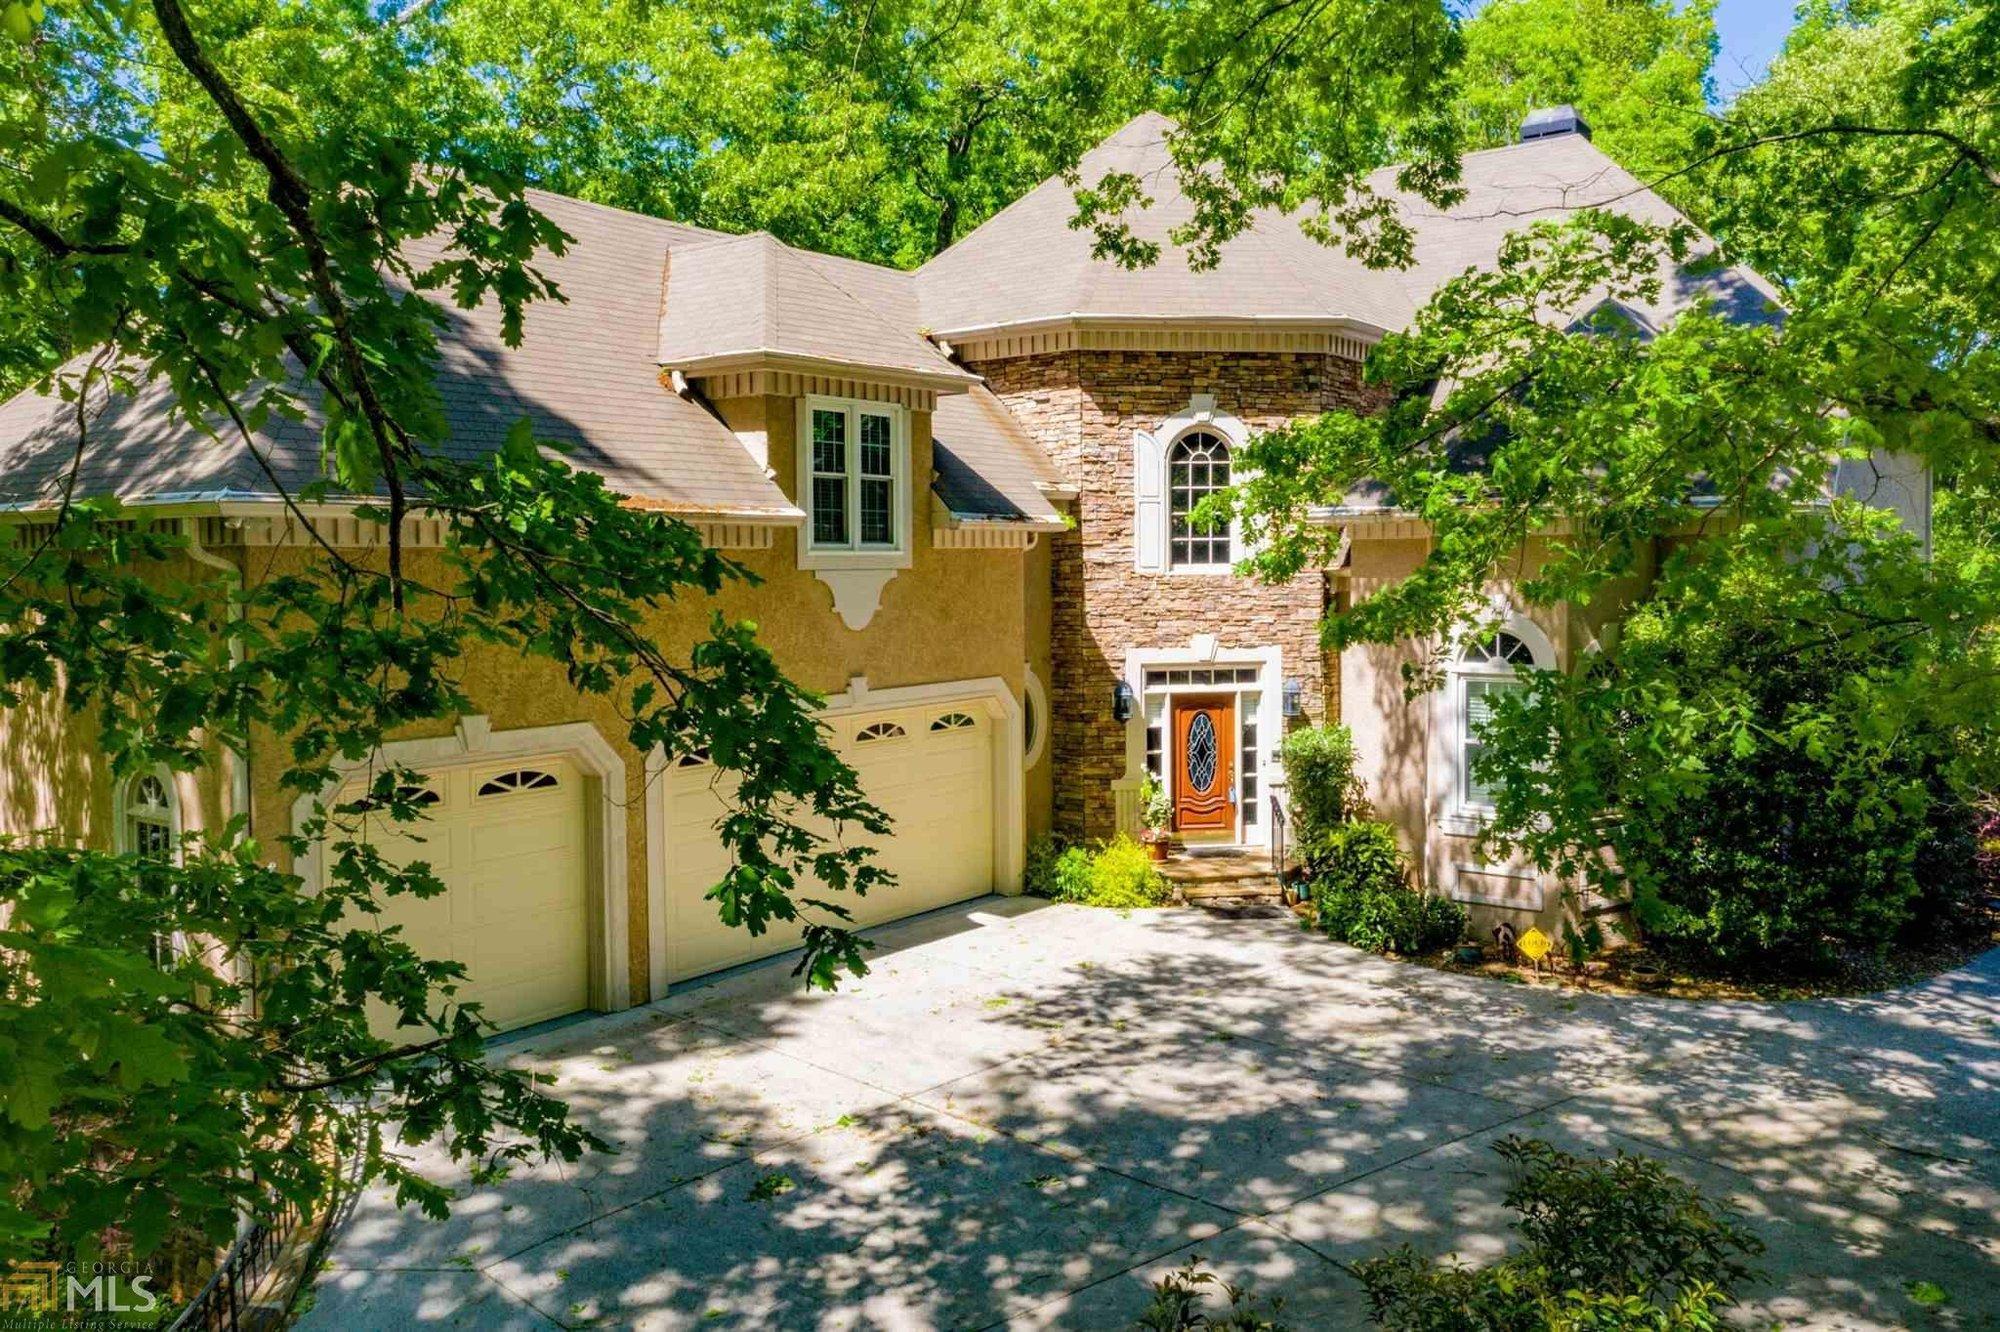 House in Woodstock, Georgia, United States 1